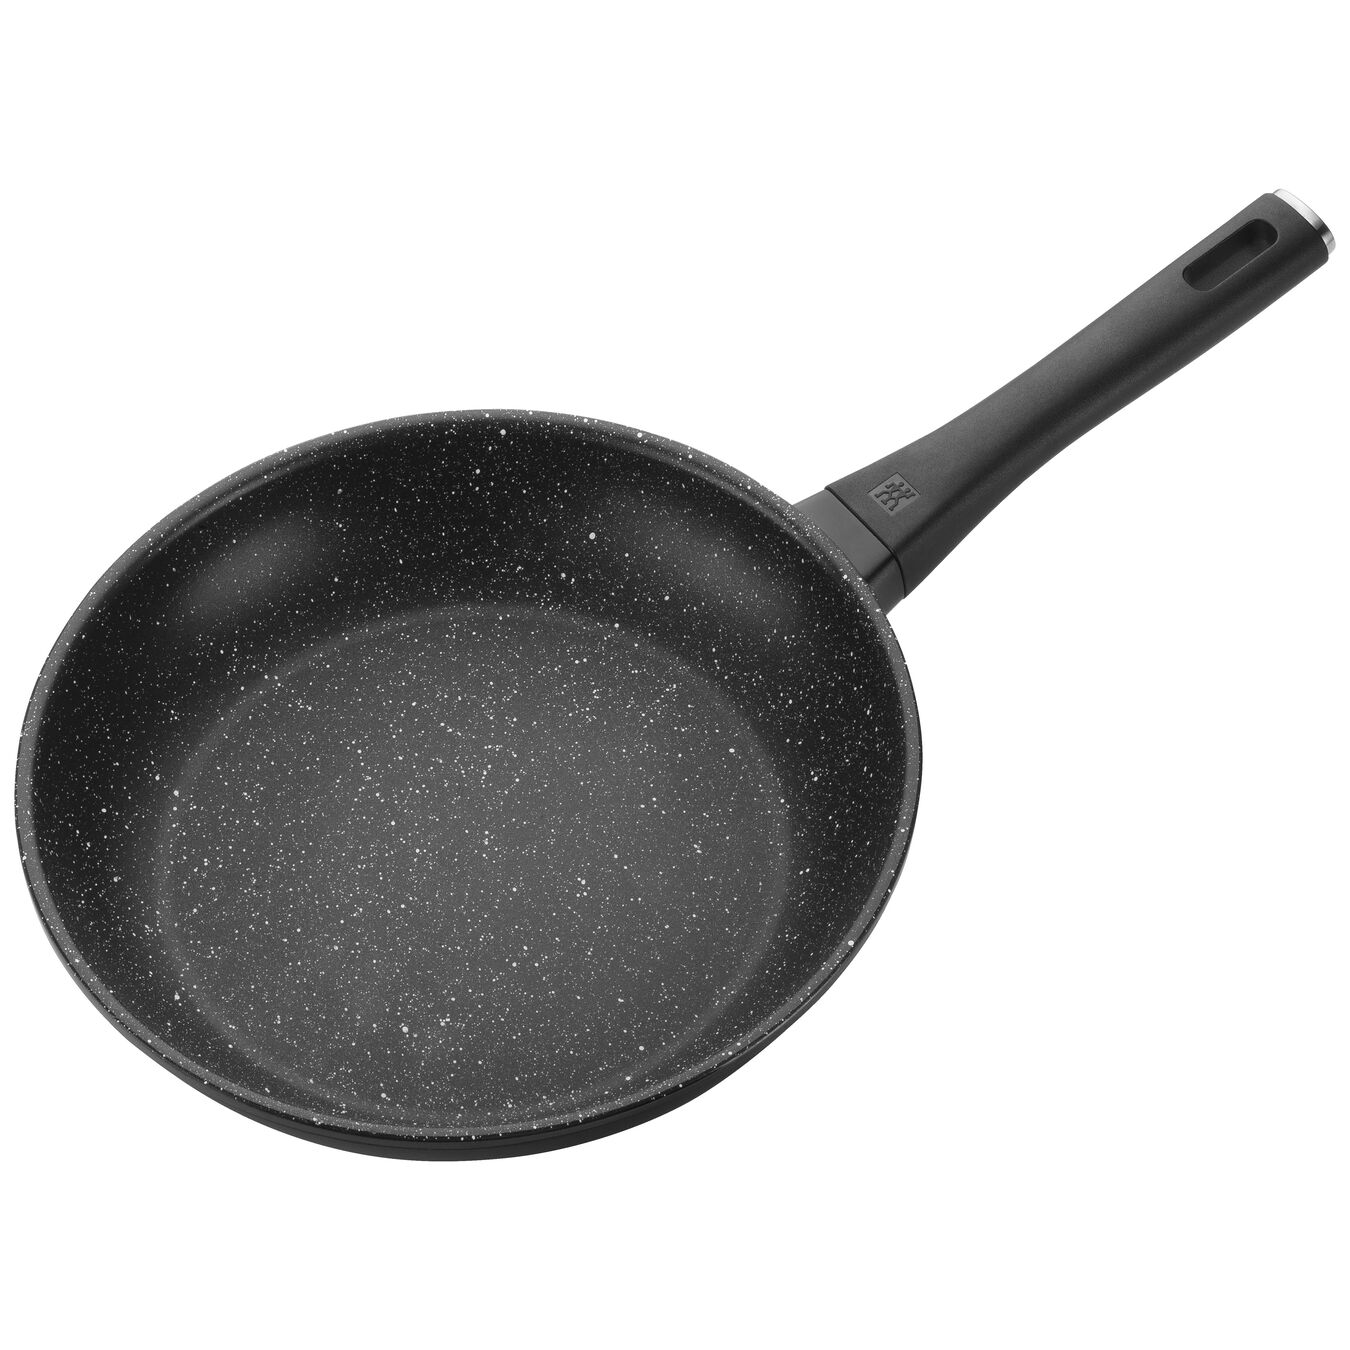 20 cm / 8 inch Aluminum Frying pan,,large 4